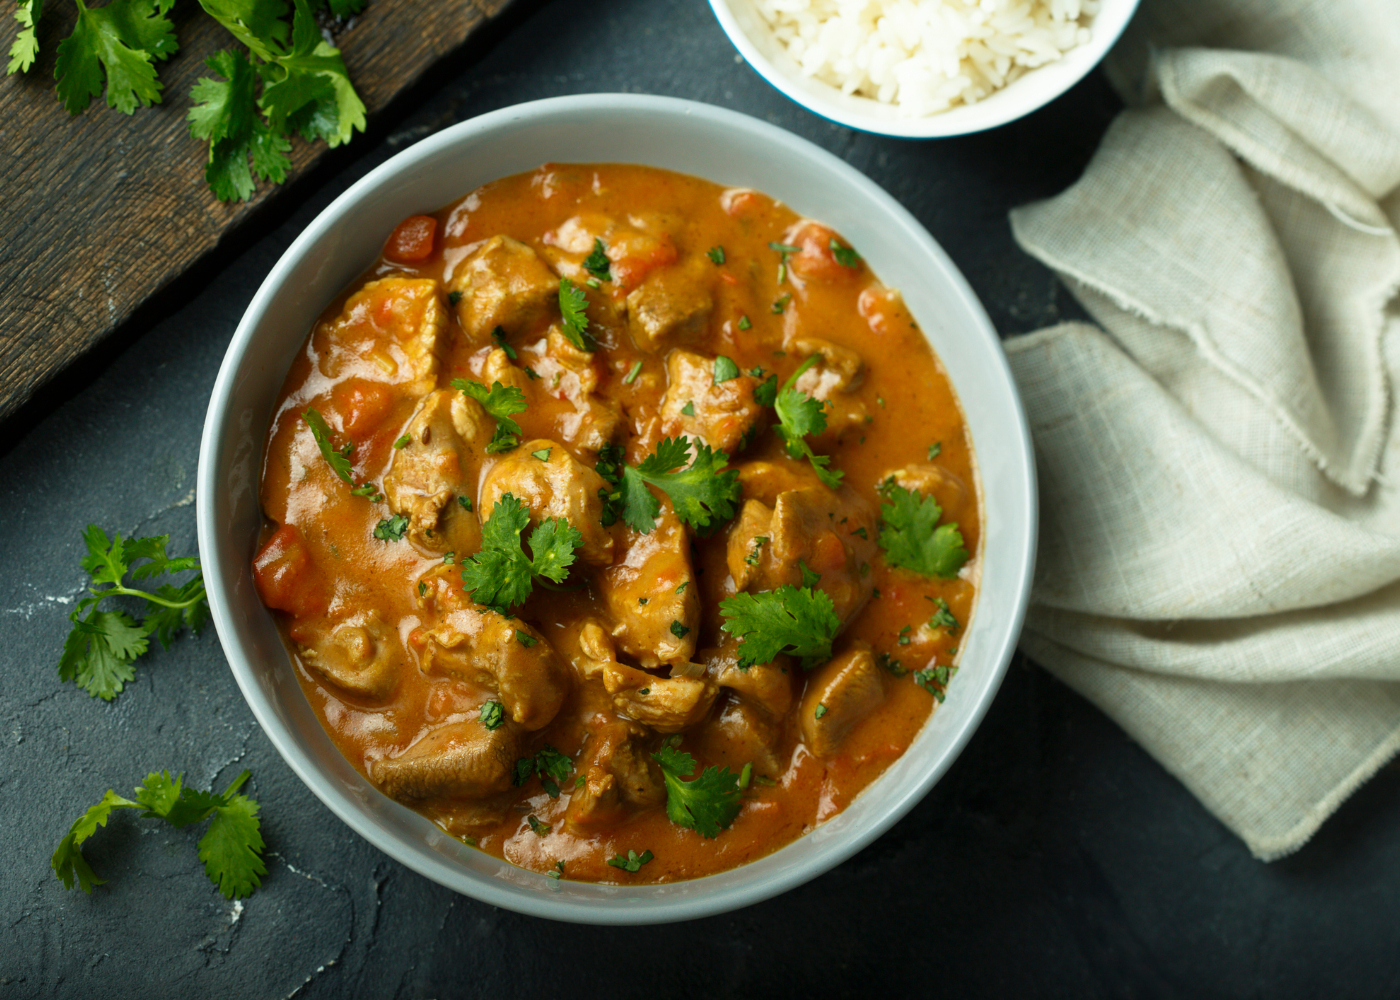 receitas apetitosas de caril de frango: delicie-se como nunca